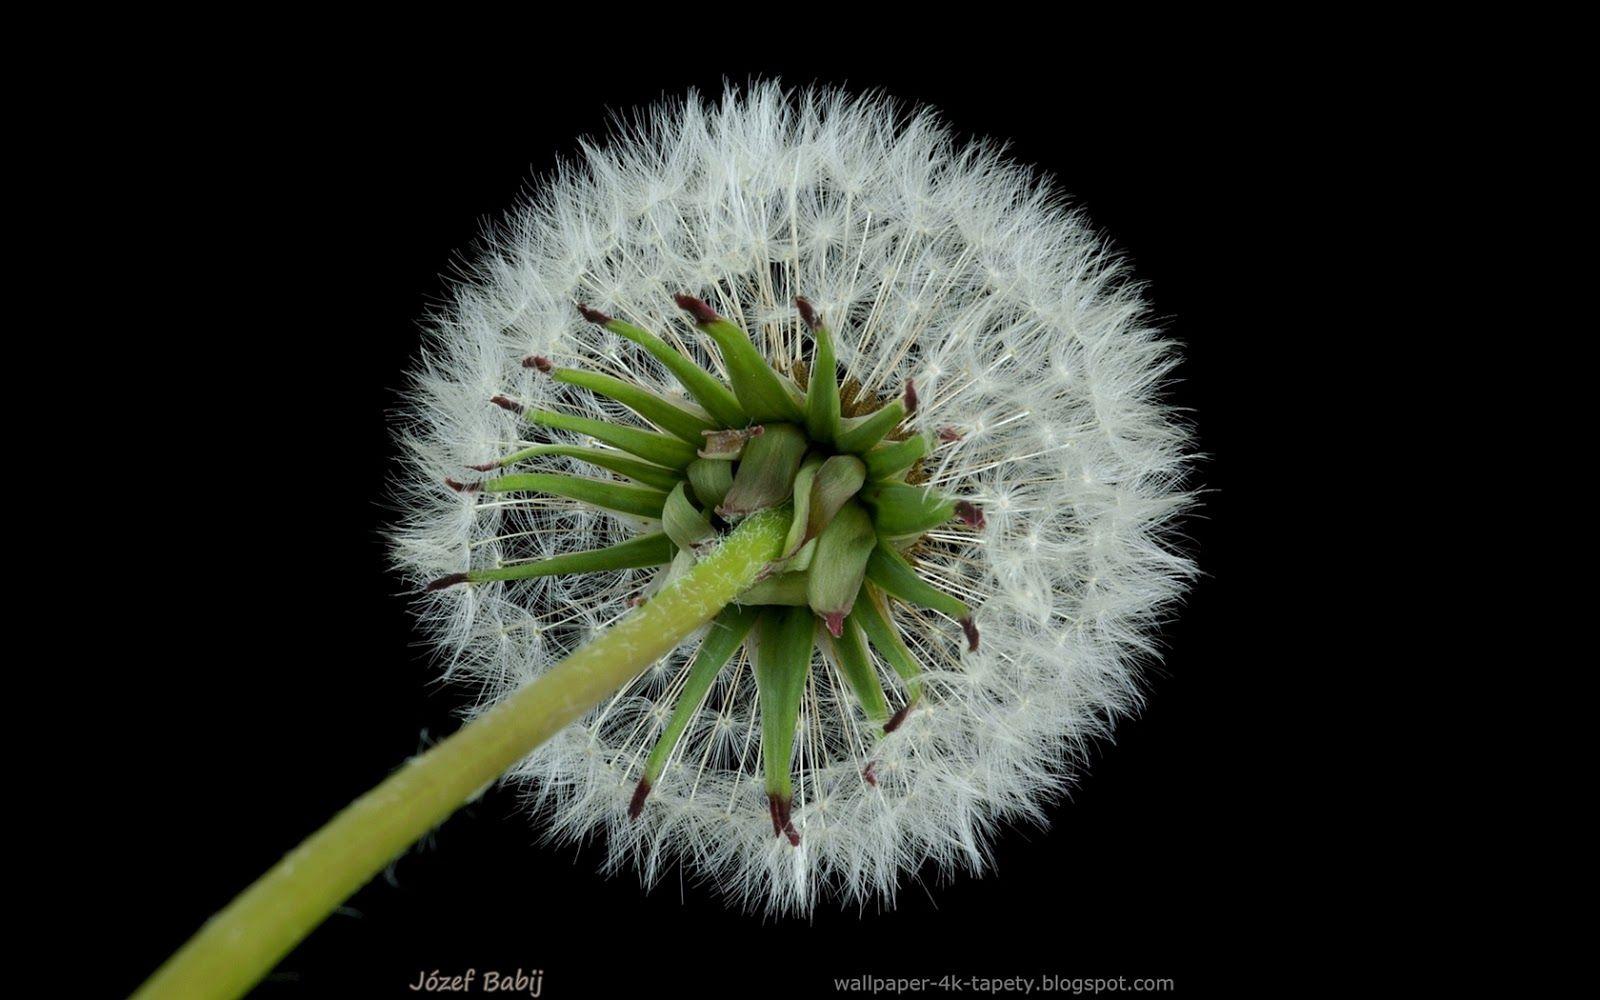 Tapety Na Pulpit 4k Ultra Hd Full Hd I Inne Rozdzielczosci Mniszek Lekarski Dmuchawiec Owoc Taraxacum Officinale Fruit Dandelion Plants Flowers